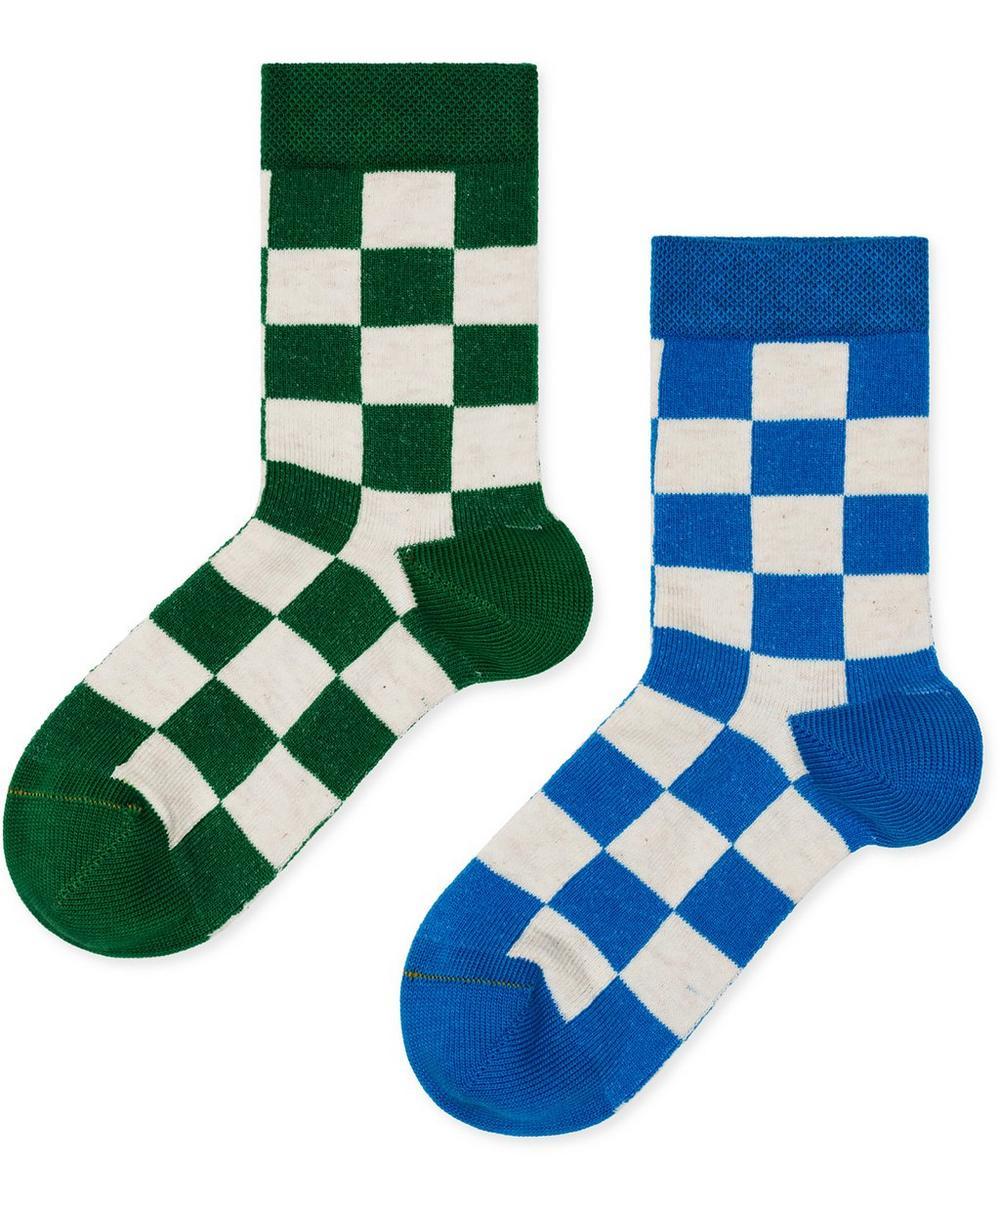 Queen Check Crew Socks 2-4 Years